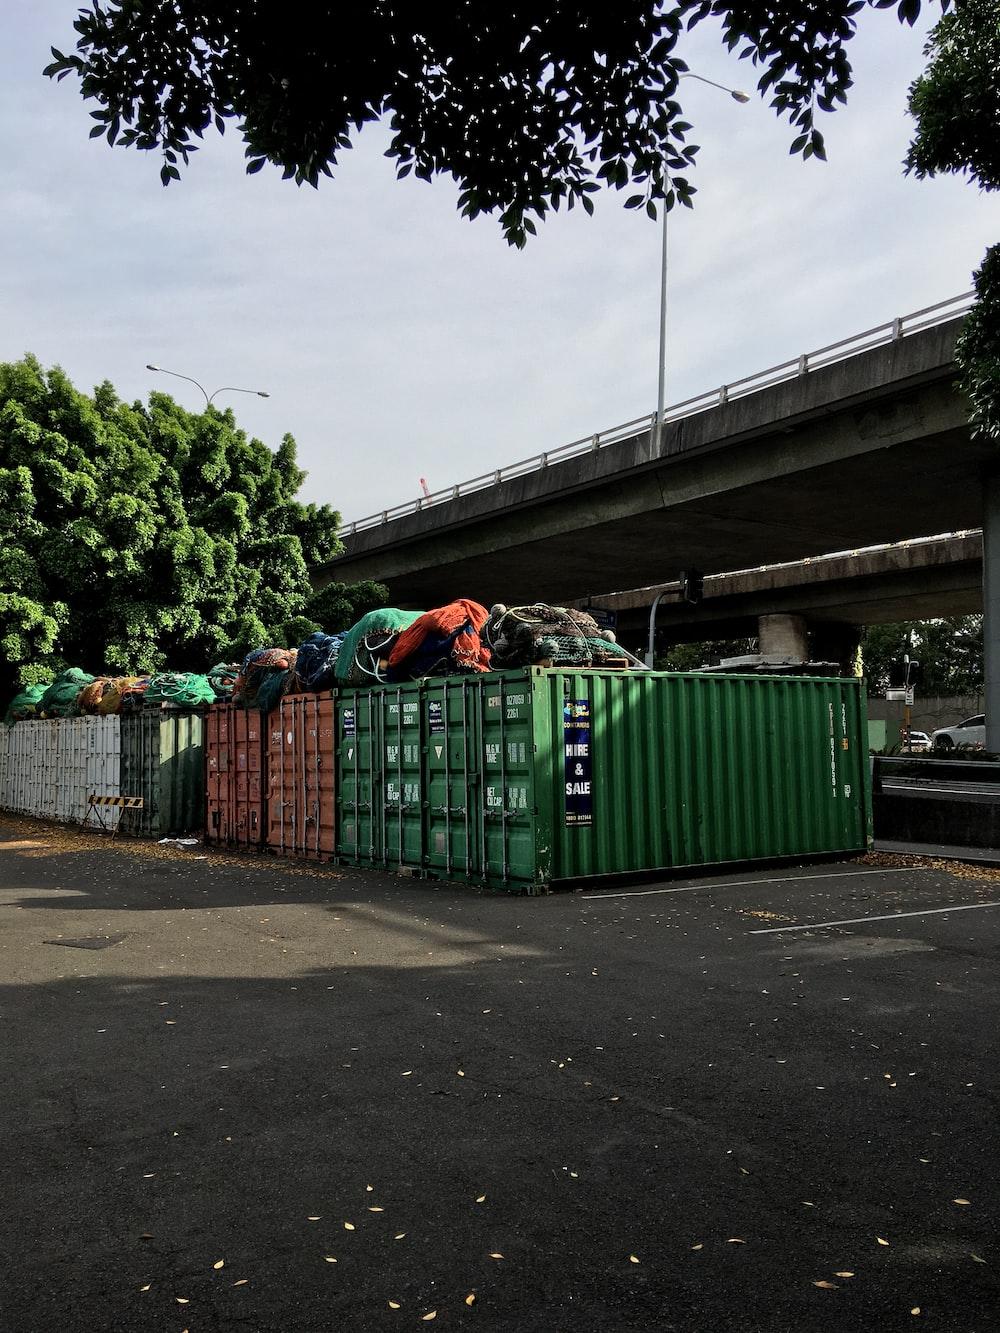 green trash bins on sidewalk during daytime